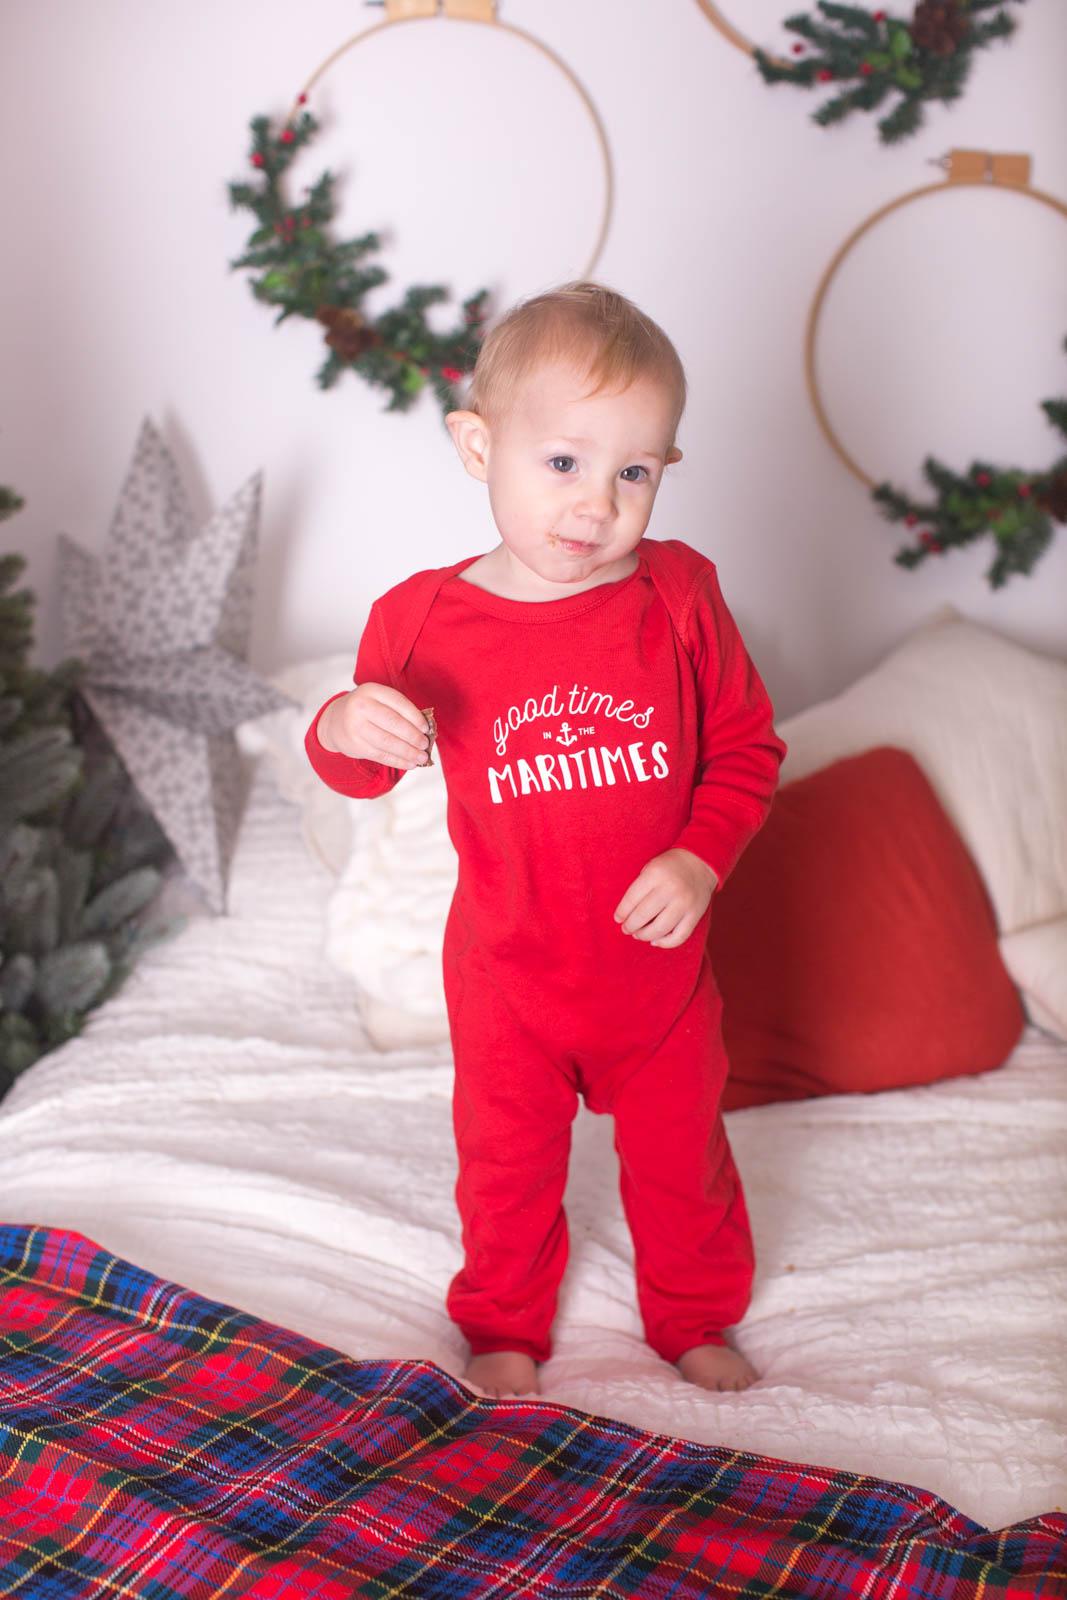 Image of boy on the bed wearing Christmas pyjamas